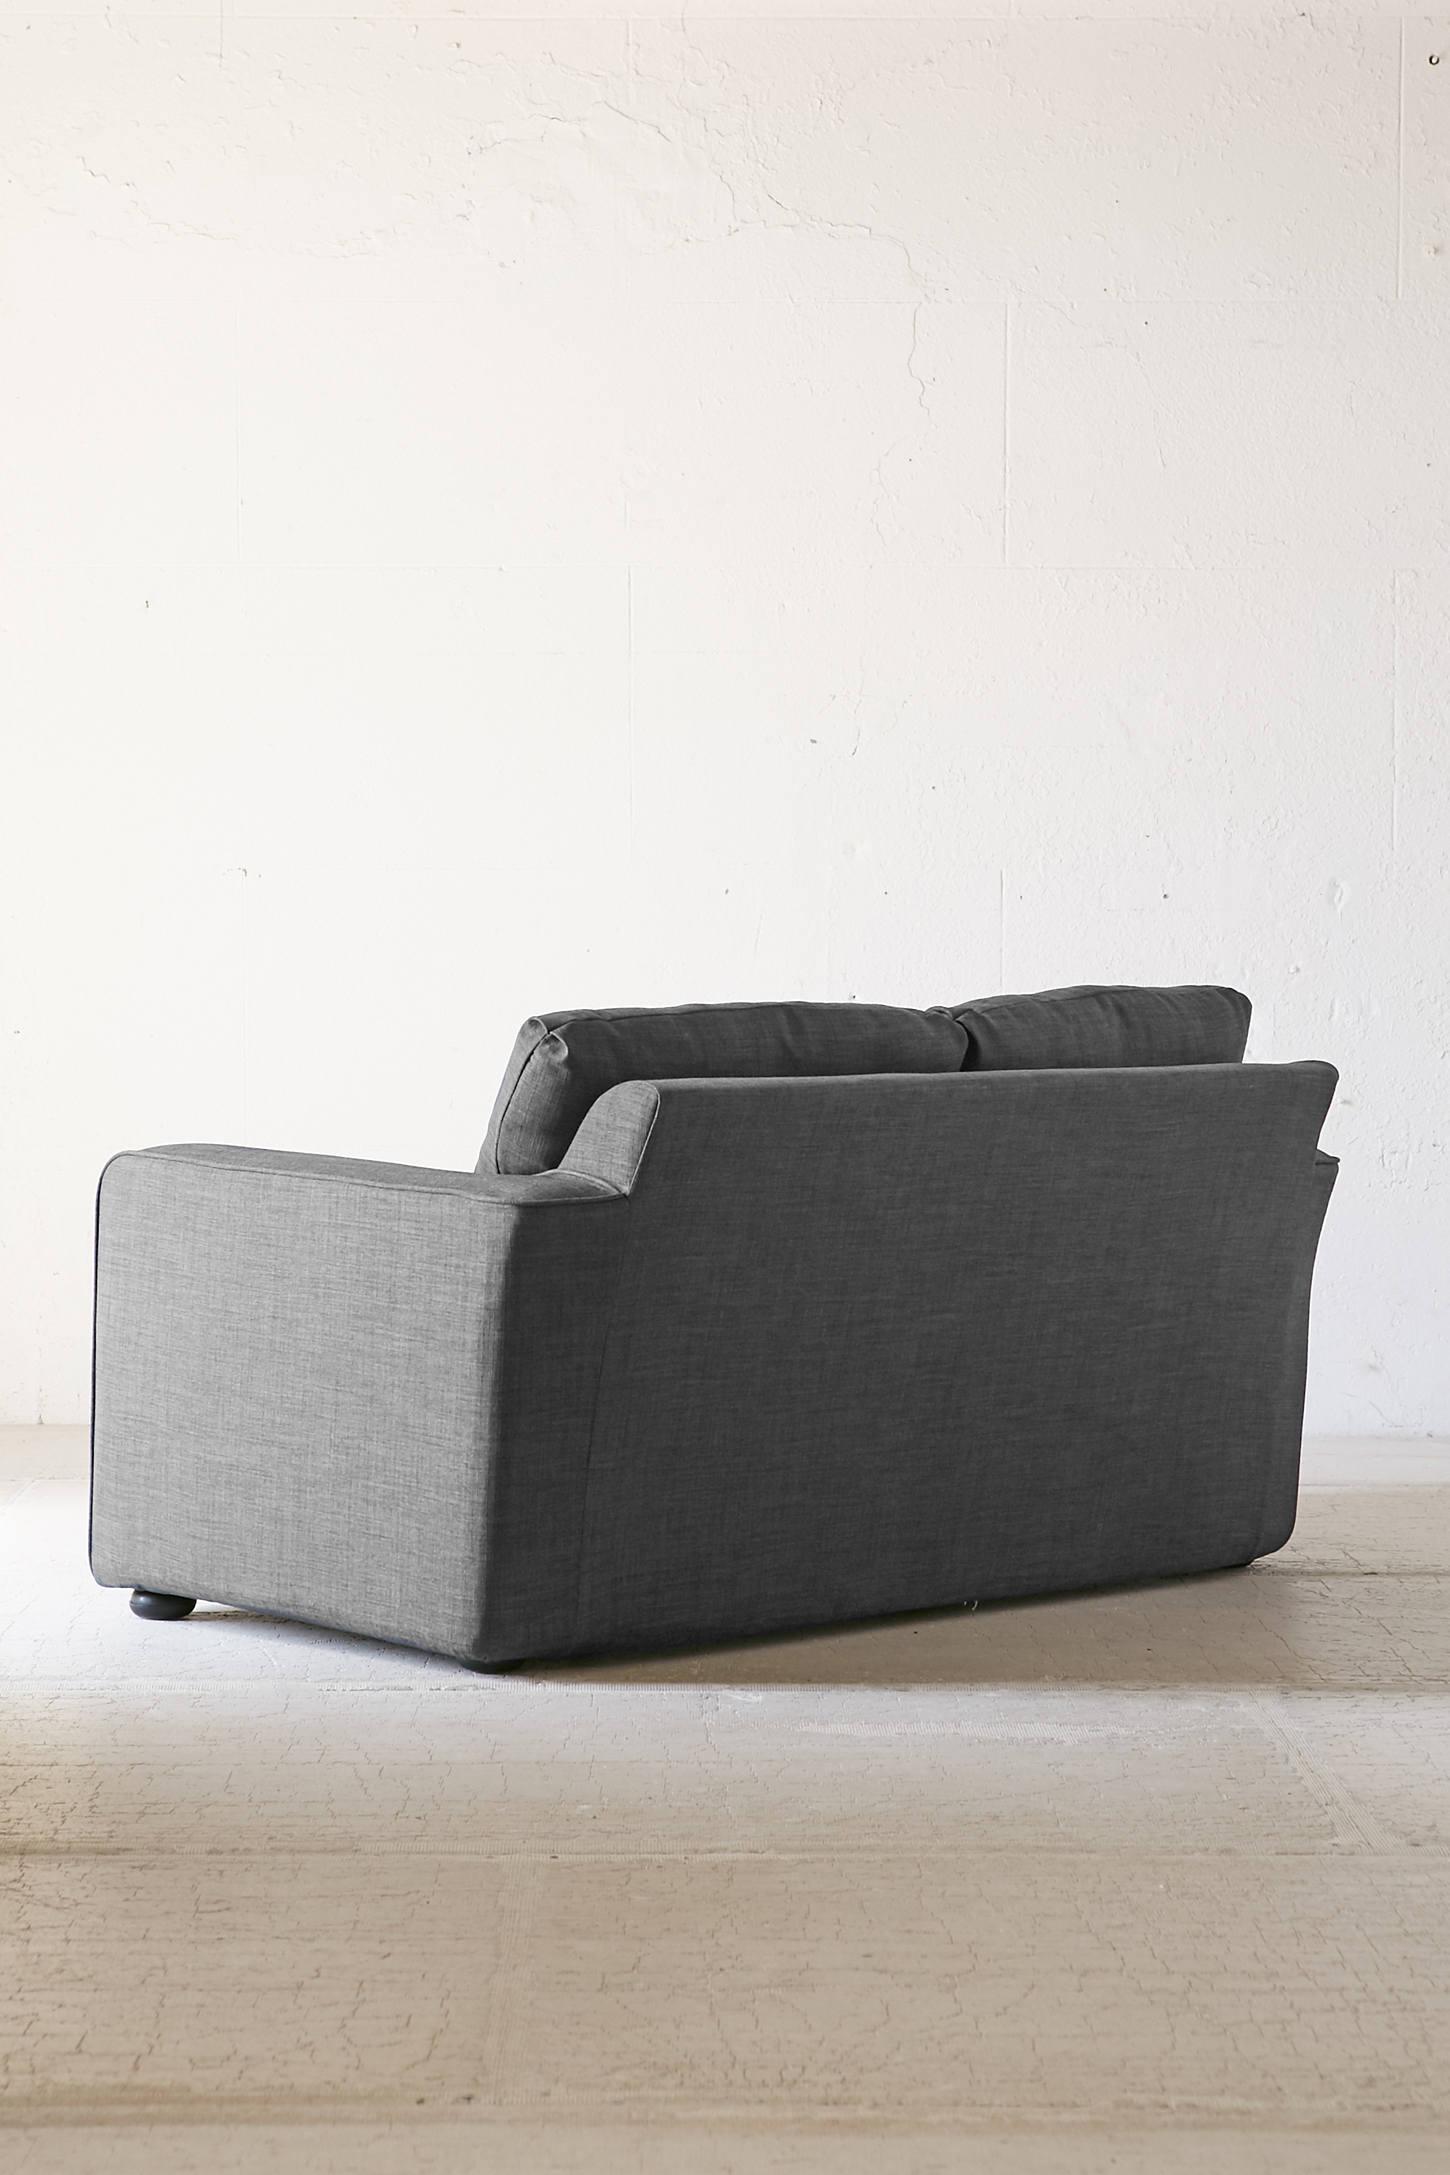 Deco Convertible Sofa